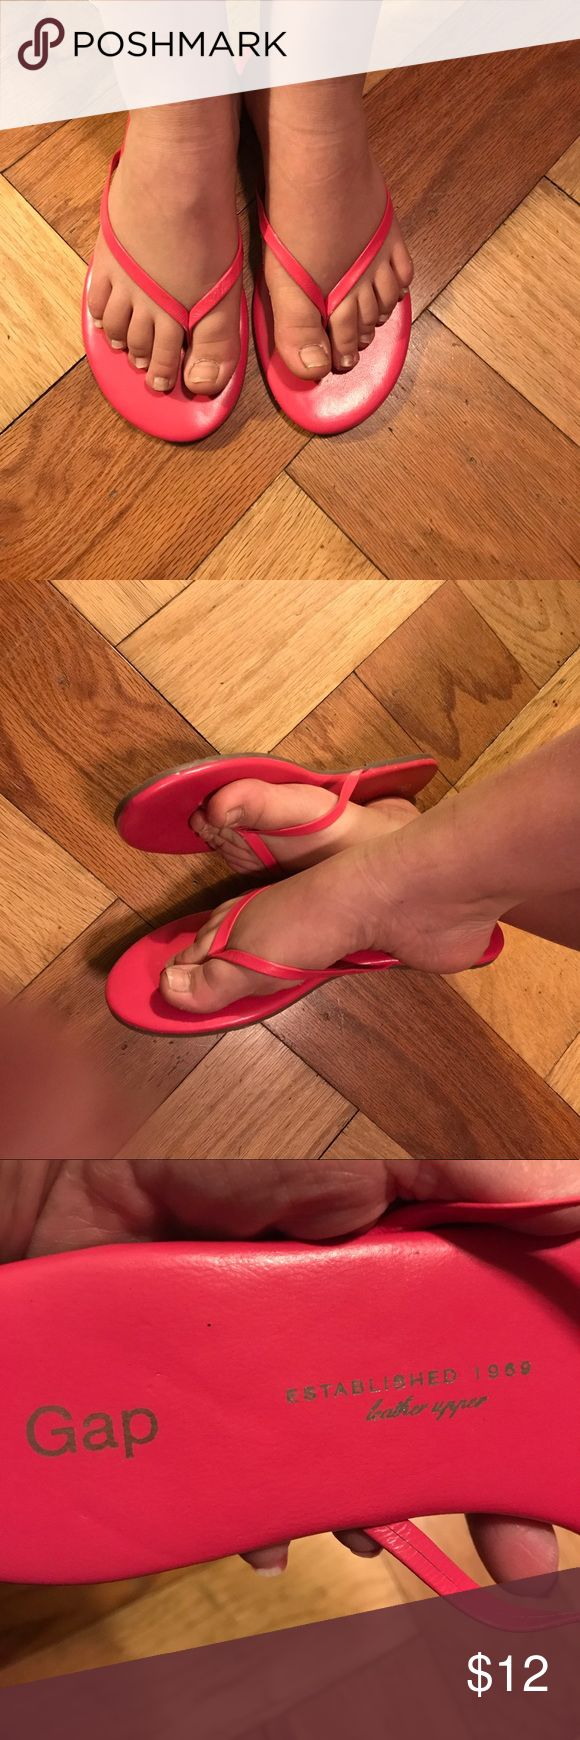 Gap brand flip-flop leather upper sandals Gap brand leather upper flip-flop sandals Gap Shoes Sandals